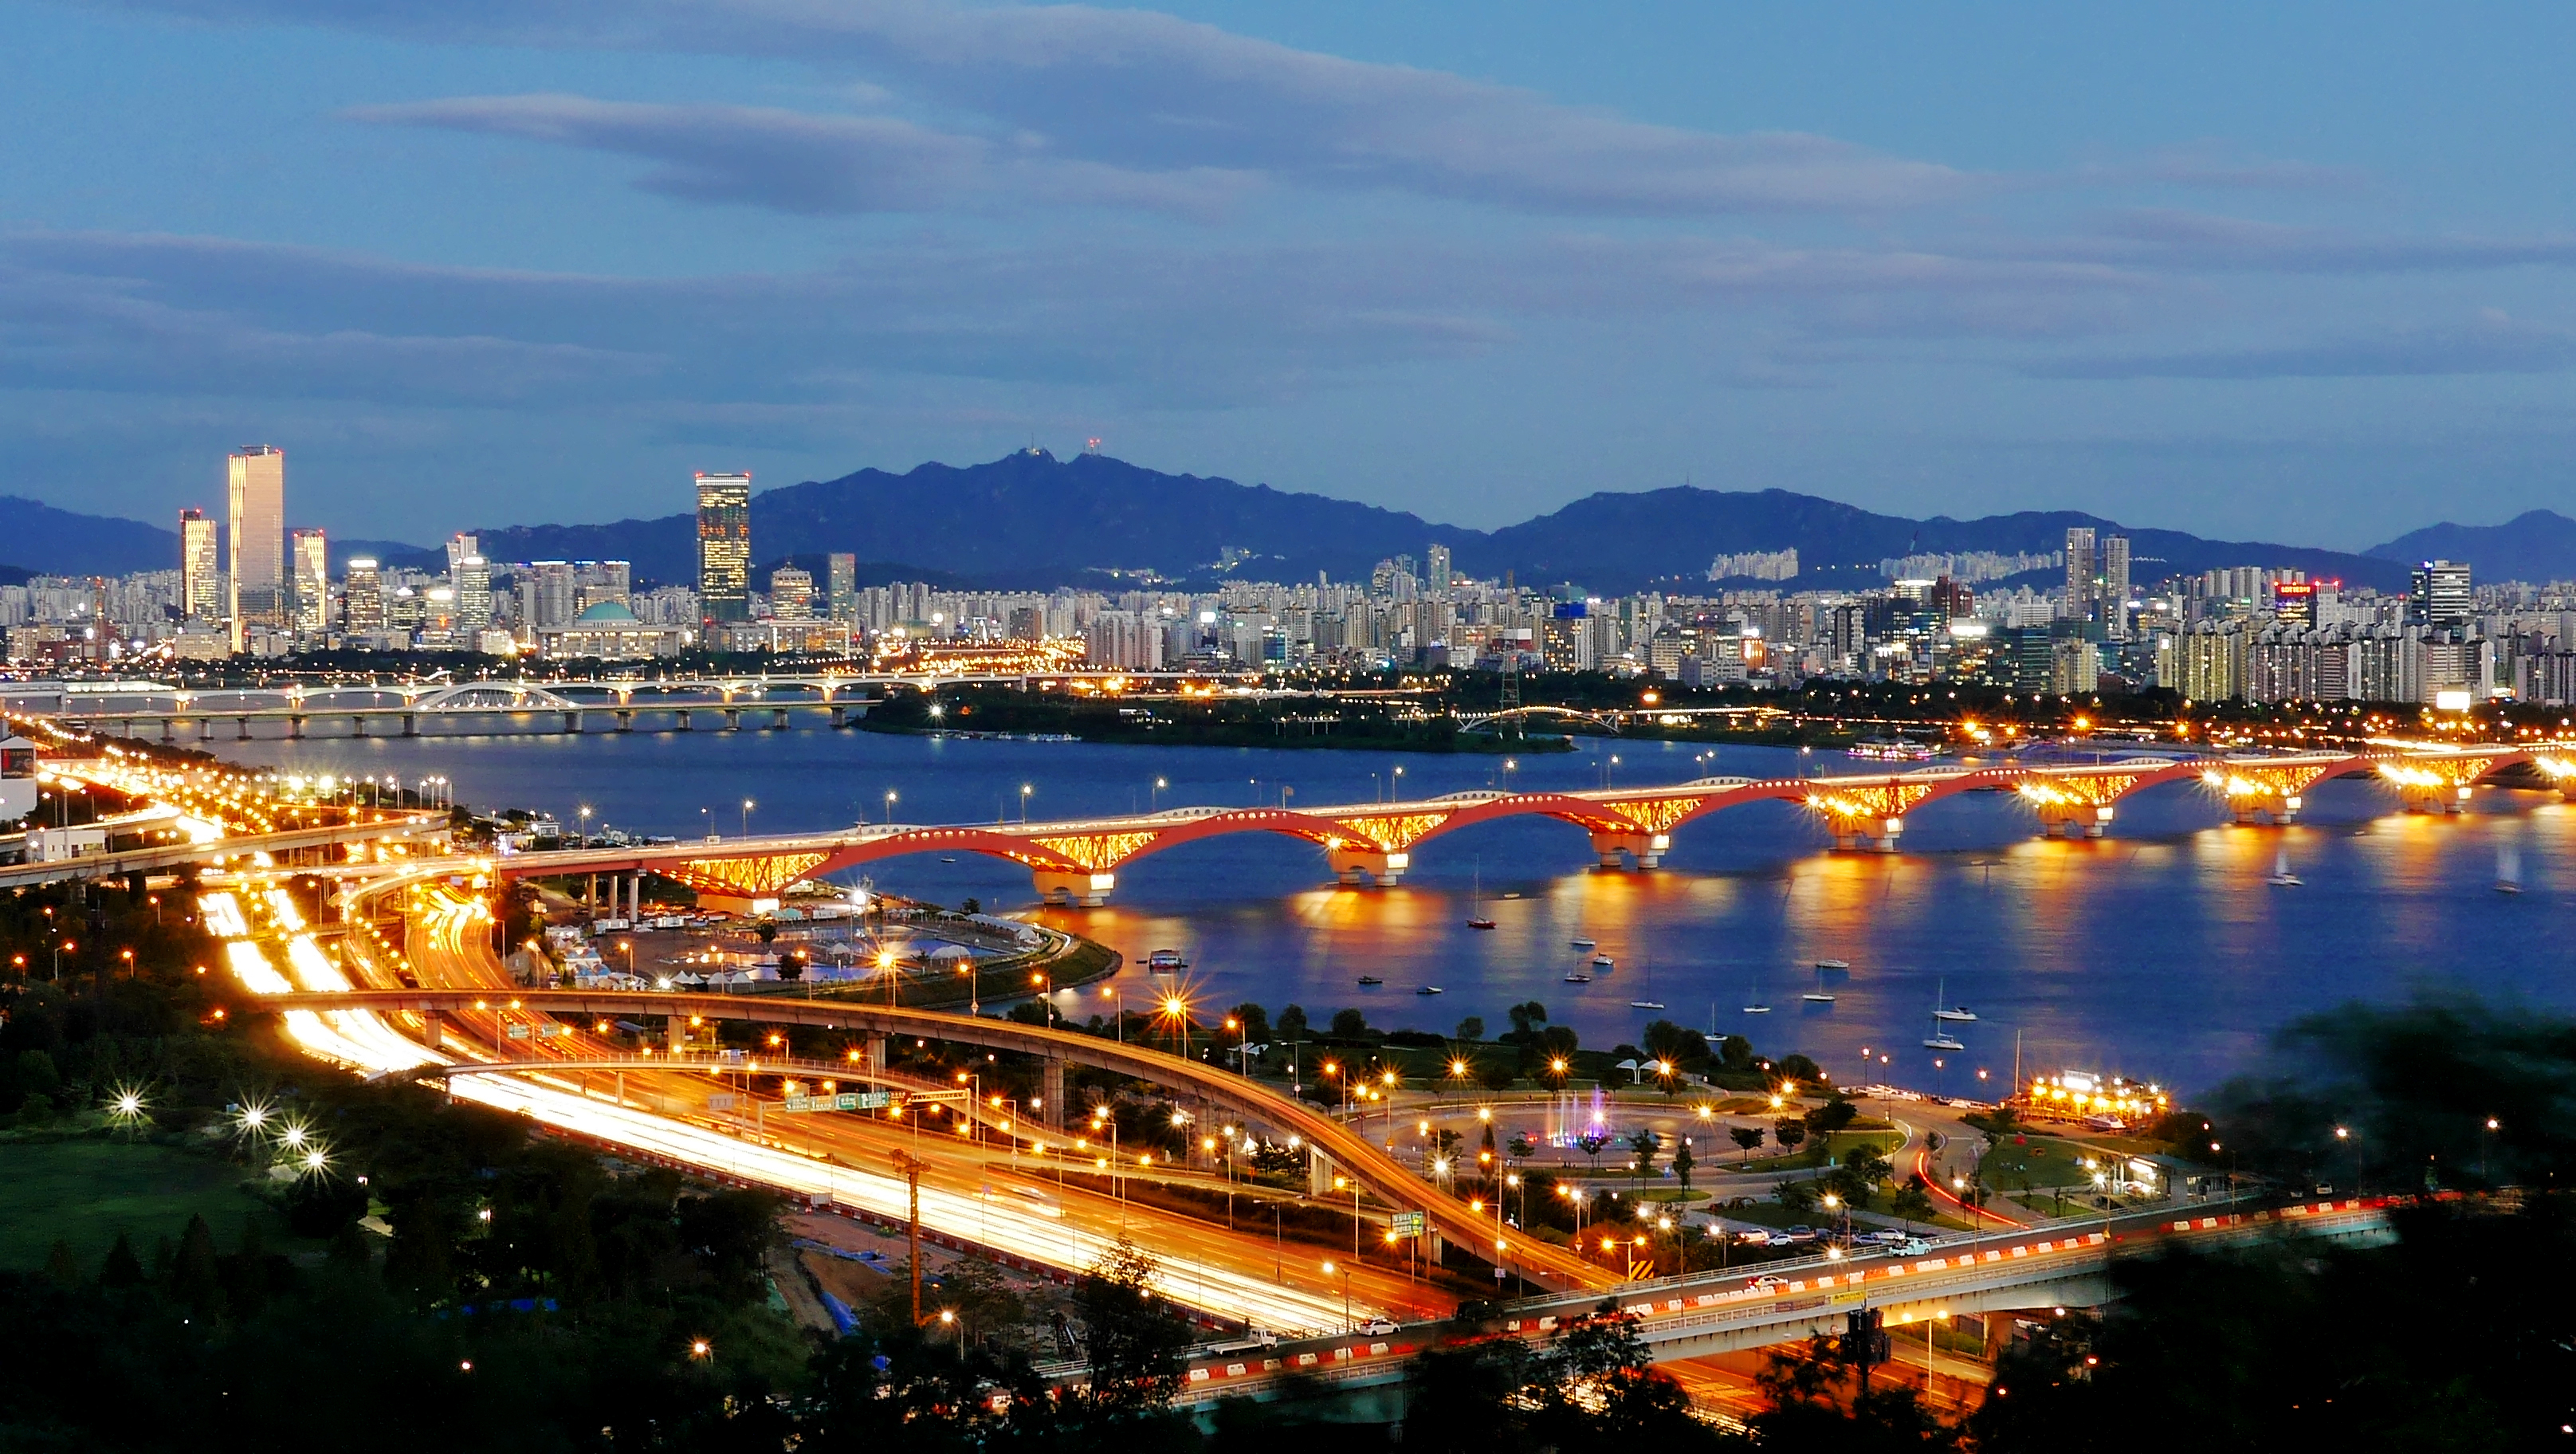 Seongsan Bridge and the Han River